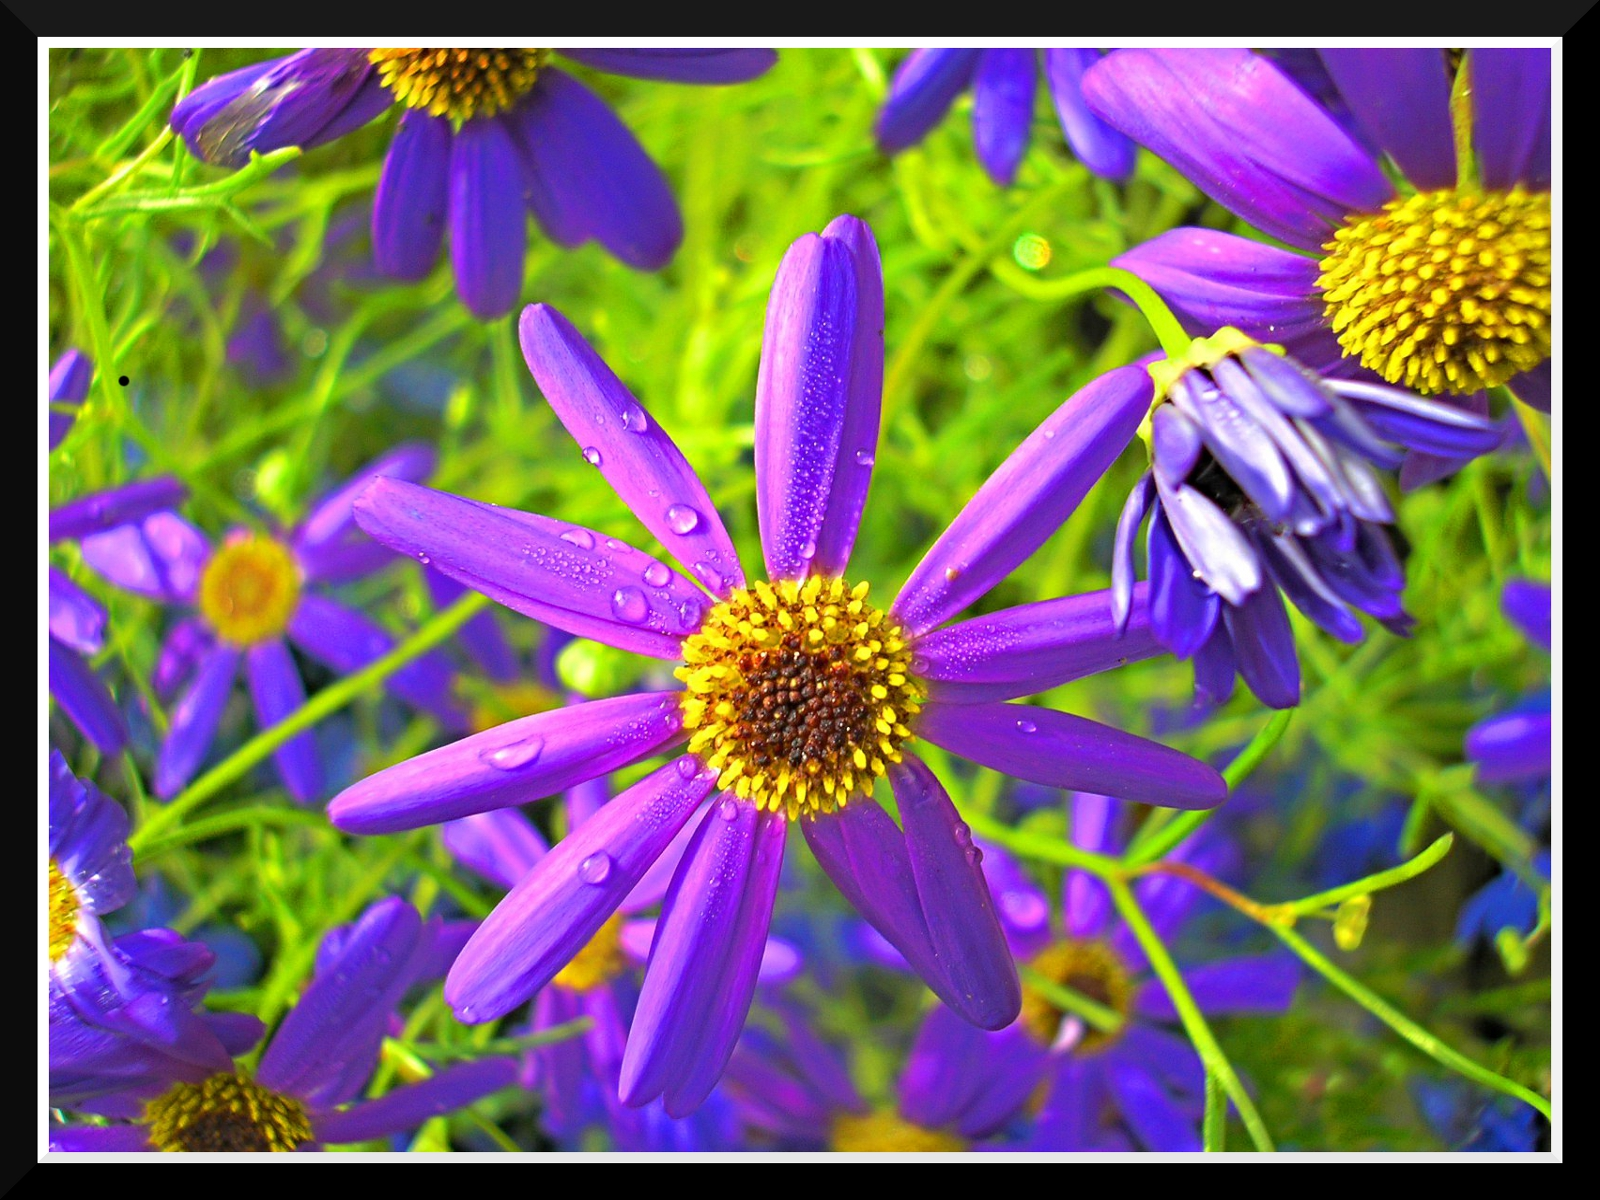 ... Purple Flowers In The Garden By Maryam2